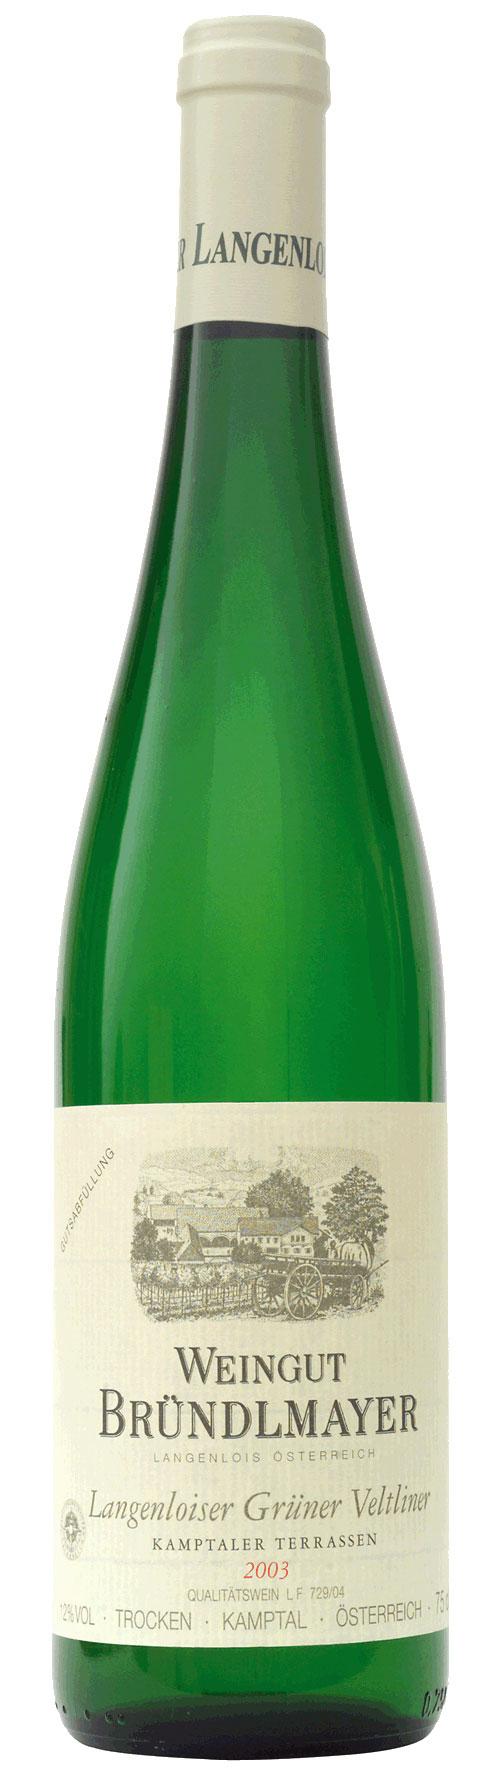 Weingut Bründlmayer Kamptal Grüner Veltliner Terrassen 2019